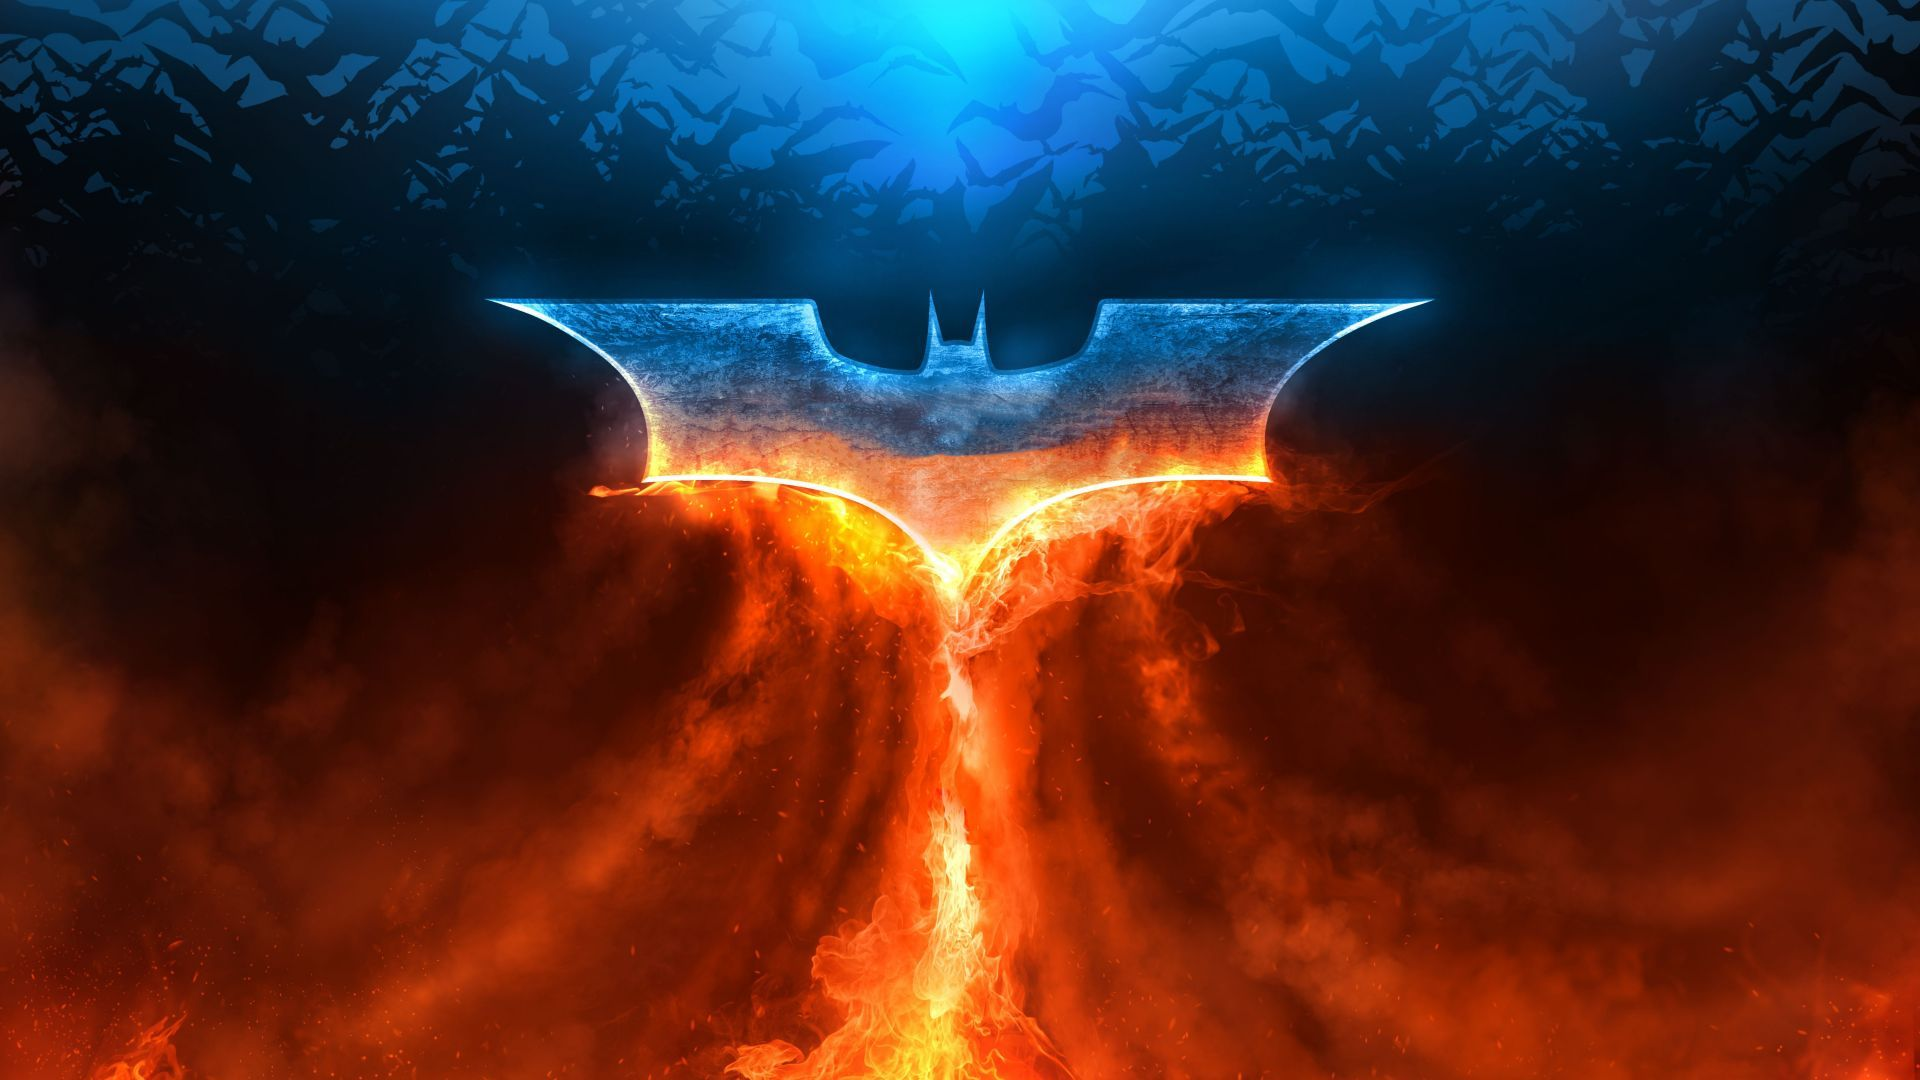 Batman Logo Fire Hd 5k In 2020 Batman Wallpaper Logo Wallpaper Hd Creative Graphics